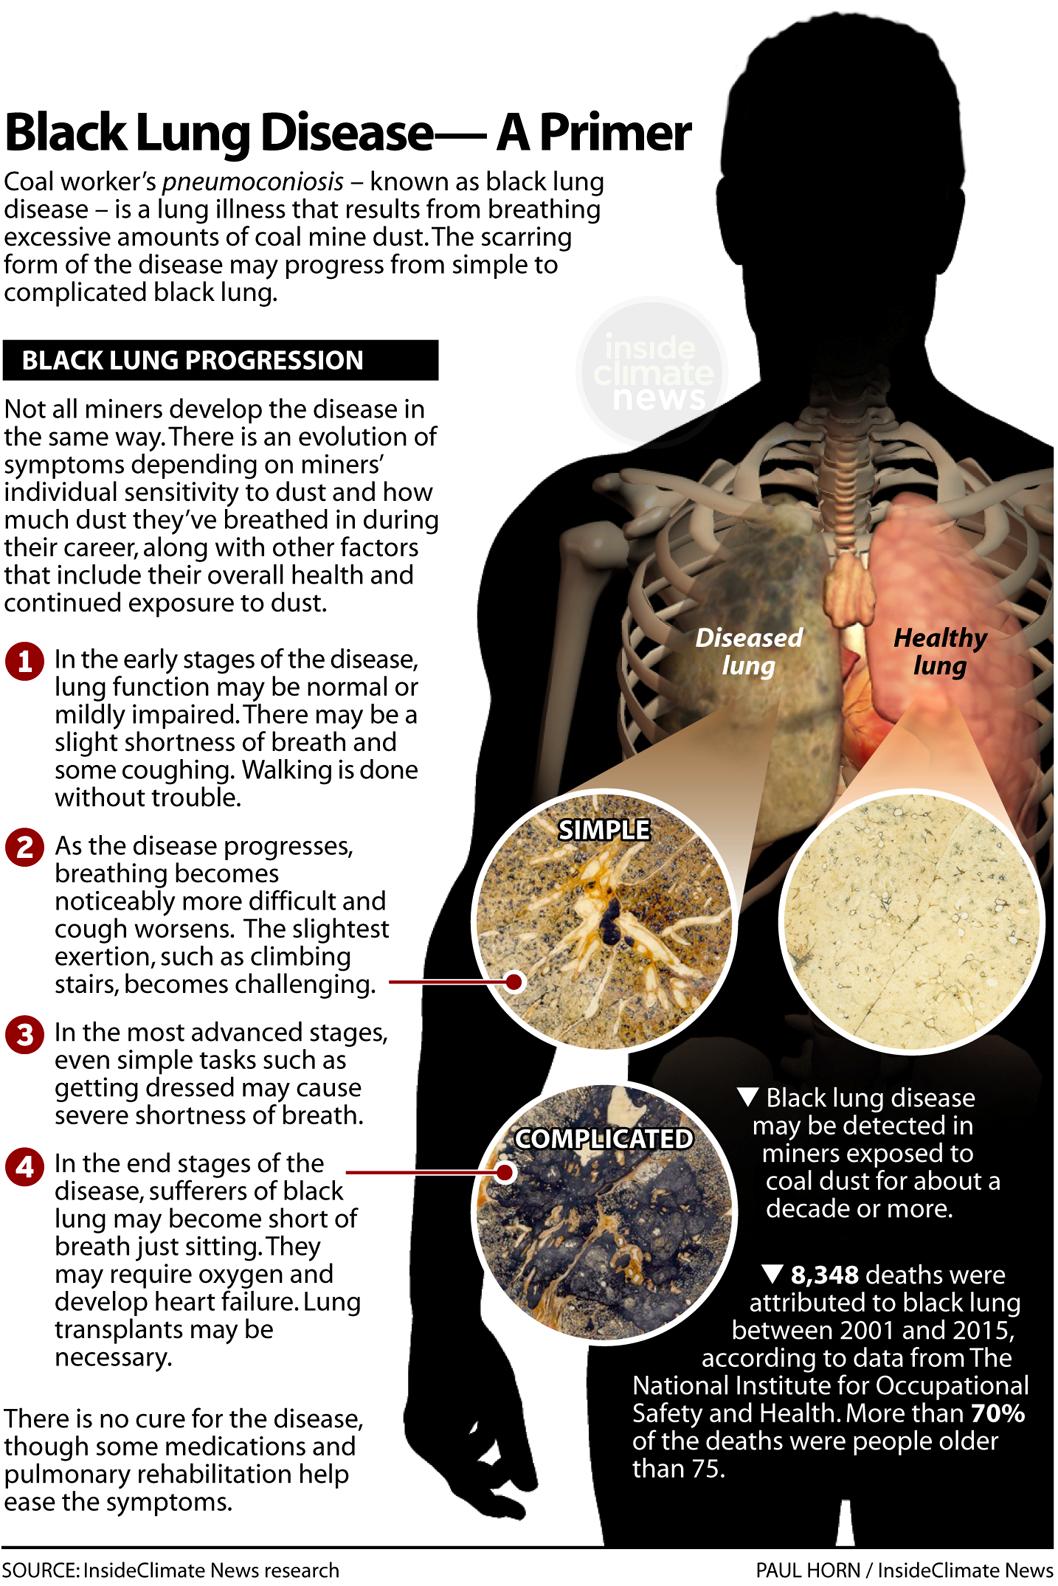 Black Lung Disease: A Primer